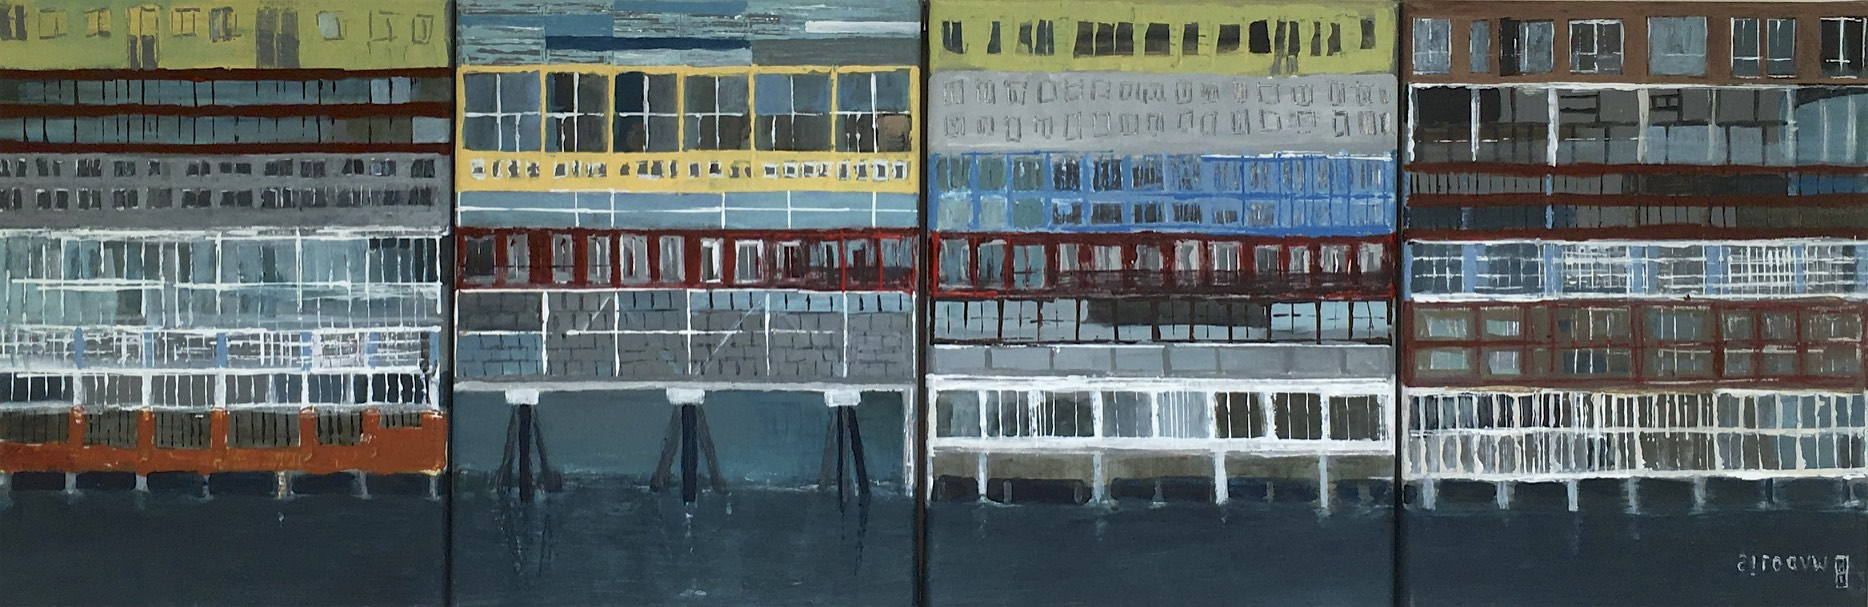 Silodam | acryl op doek | 4 x 40 x 30 cm | particuliere collectie